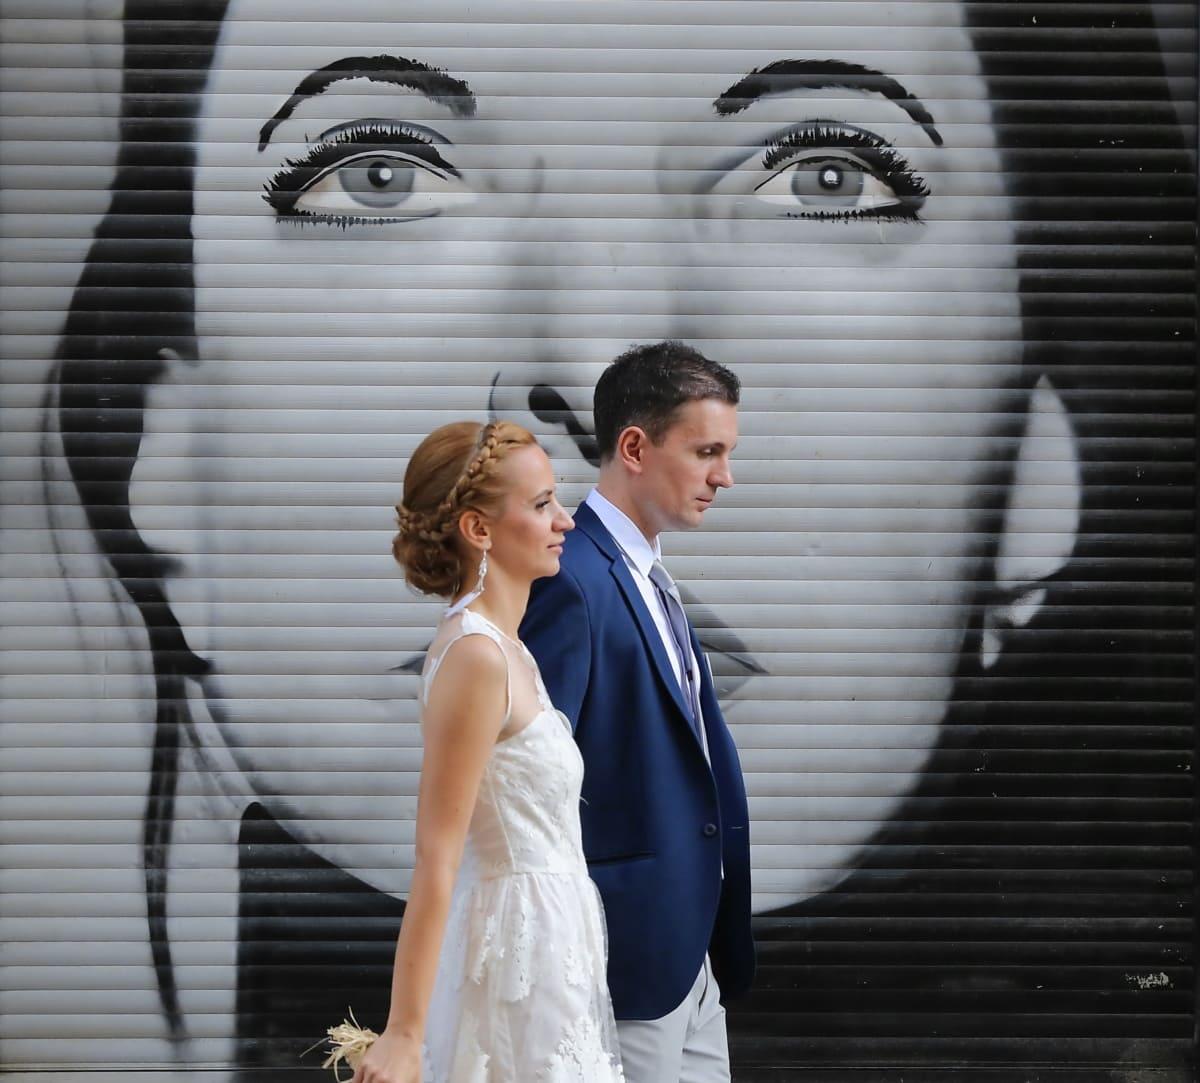 graffiti, portrait, groom, wedding dress, wedding, bride, dress, suit, tie, woman